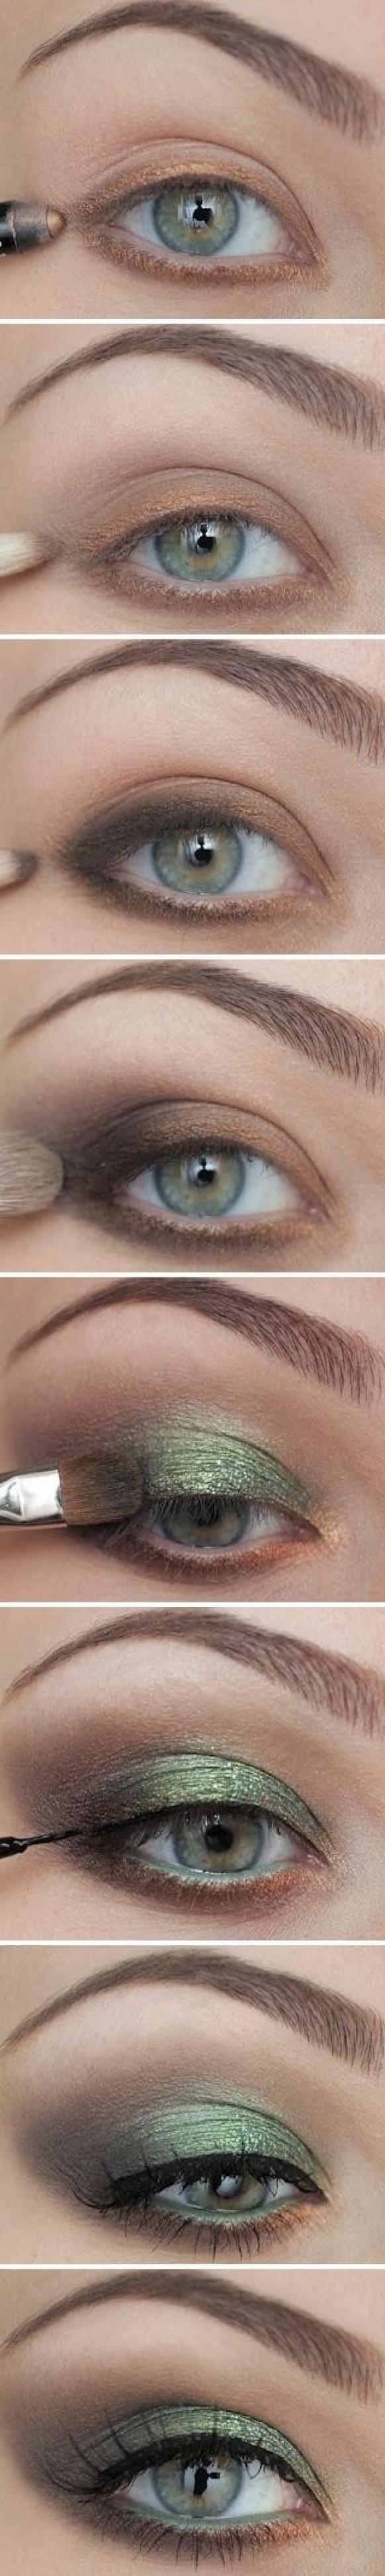 Best Bridal Makeup ? Green Smokey Eye Makeup #1702735 ...